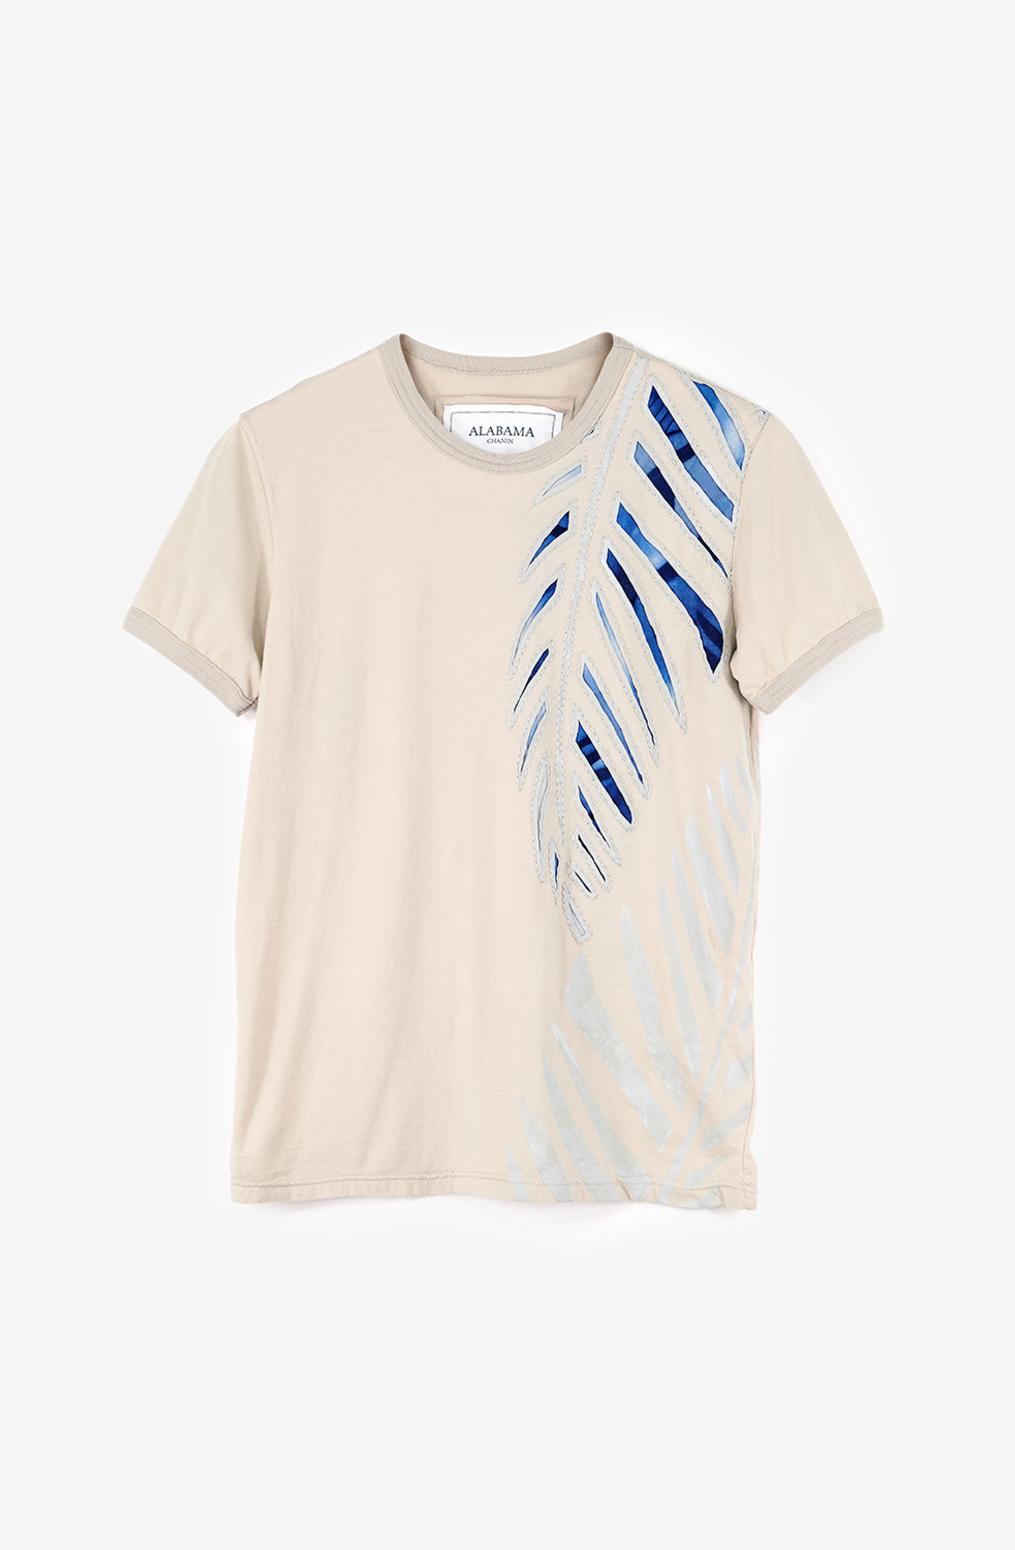 Alabama chanin lightweight organic cotton tee palm embroidery 1